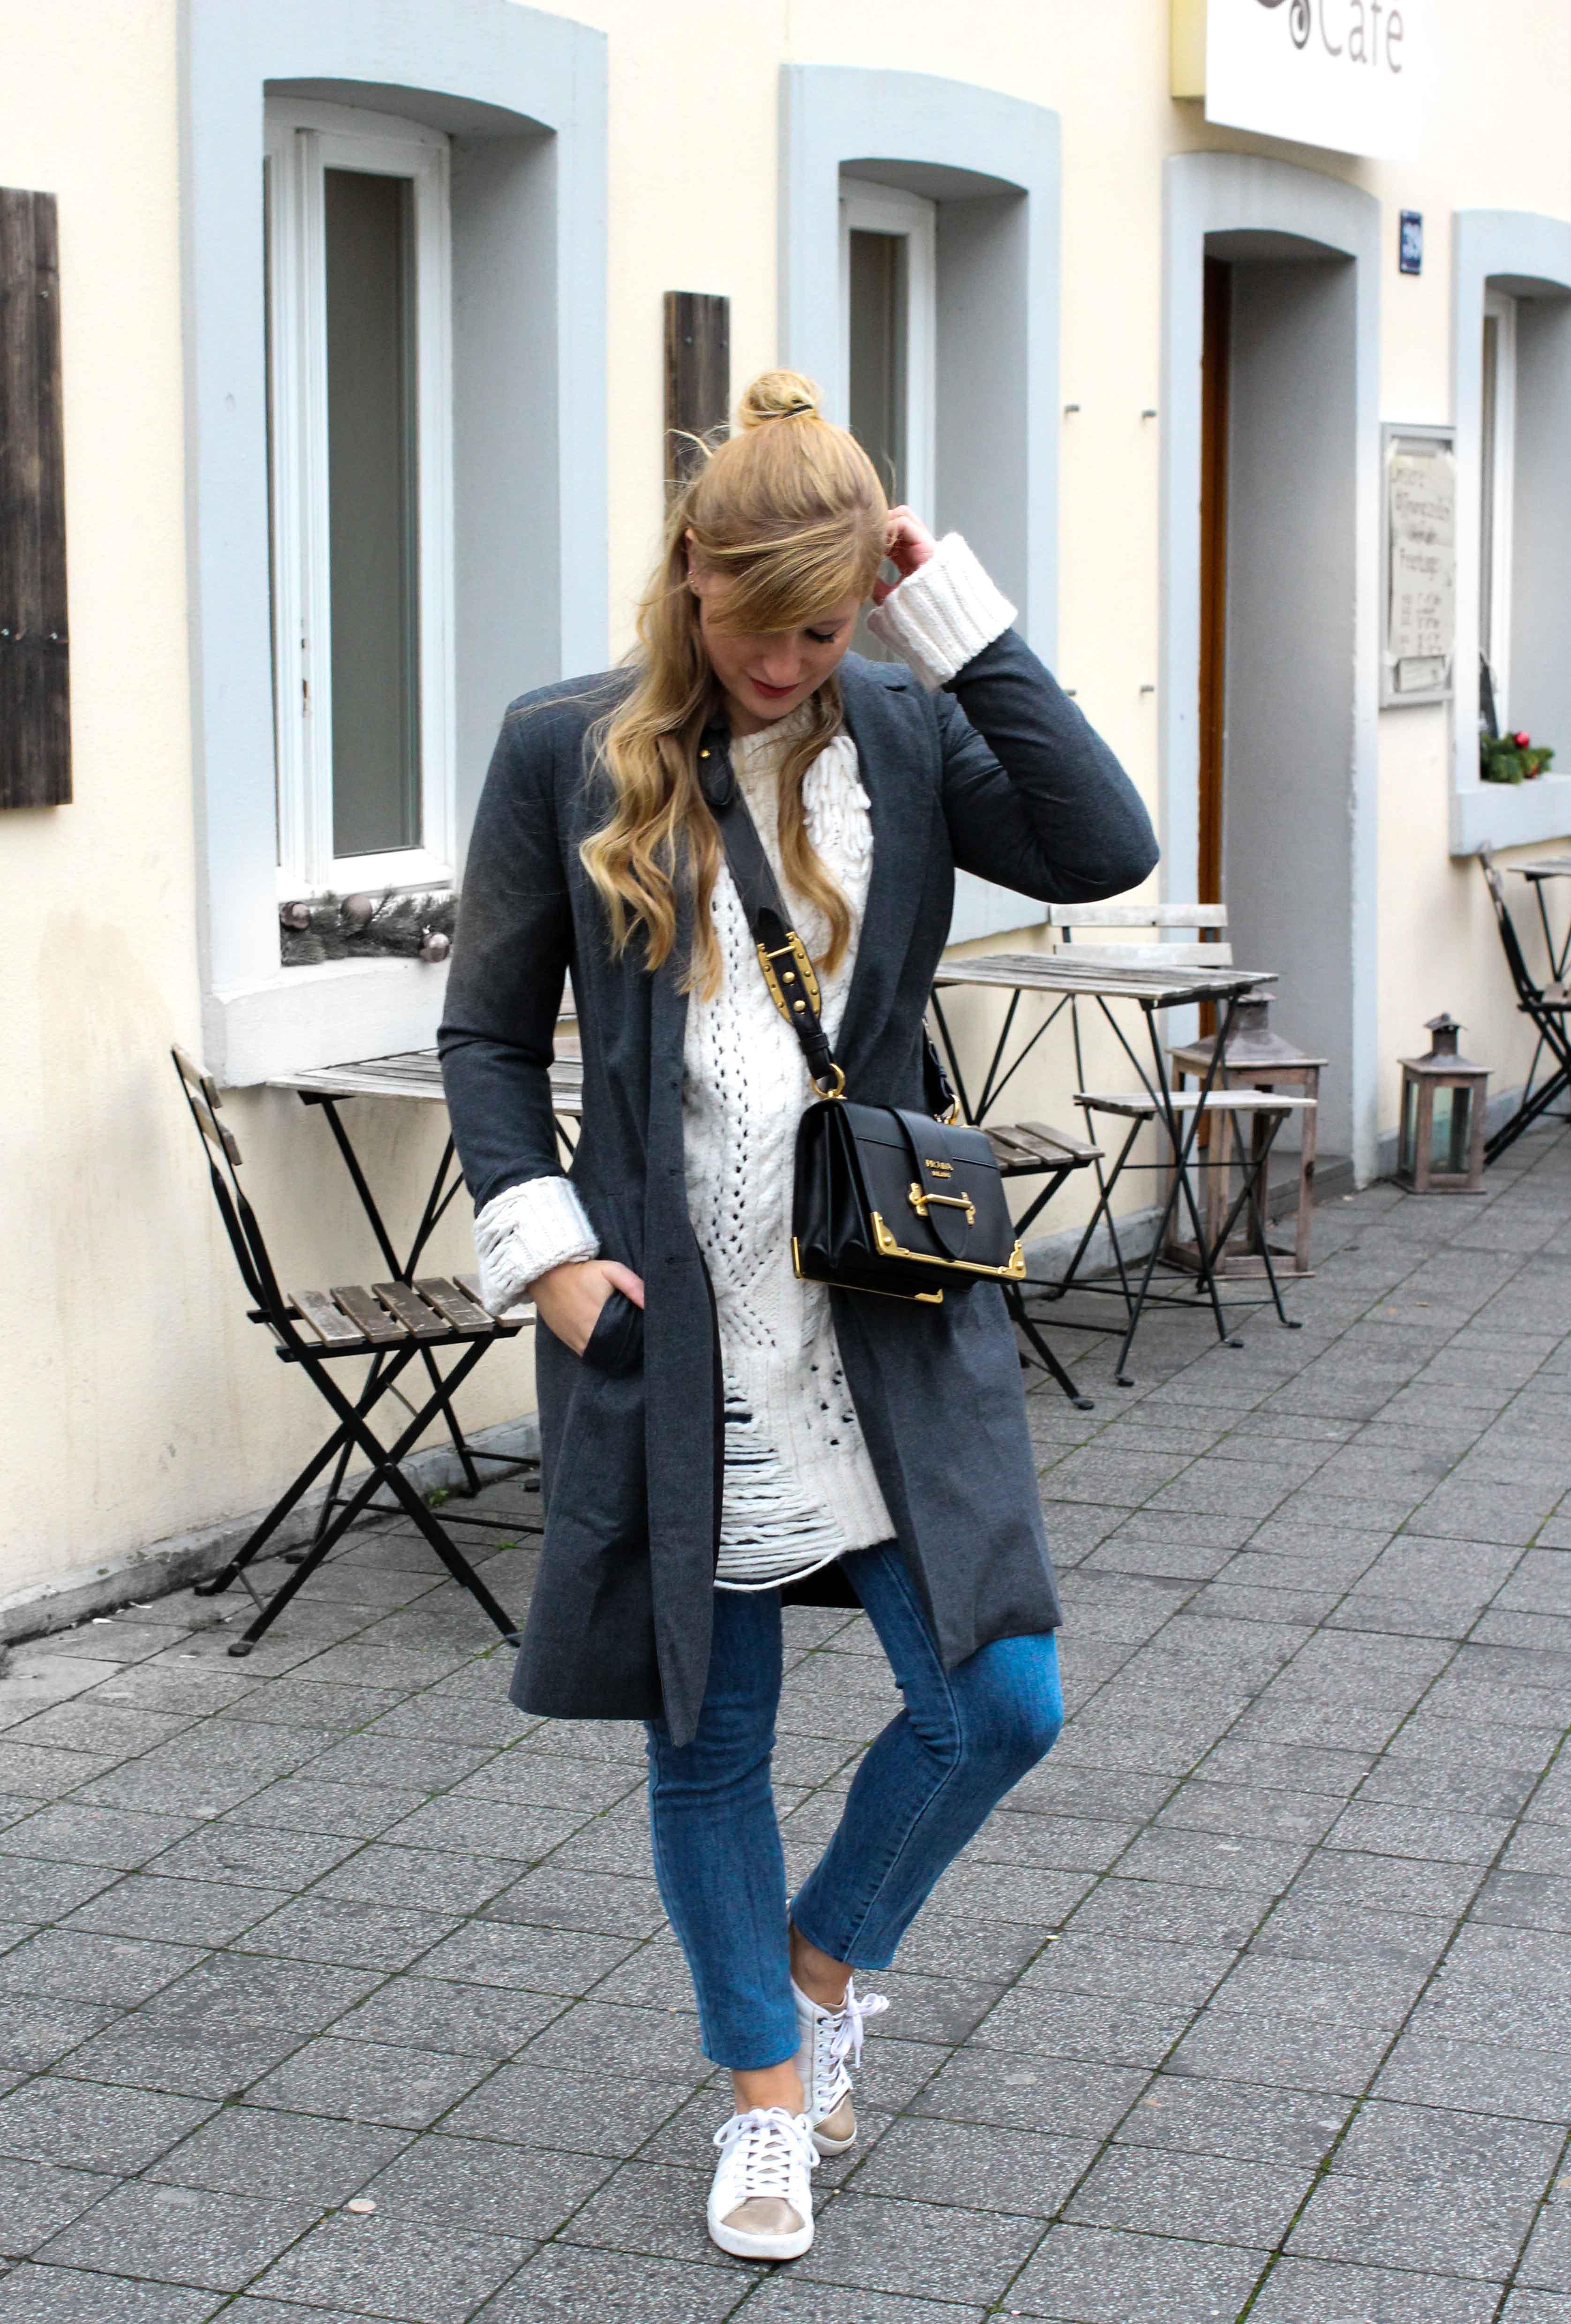 Outfit Zara Wollpullover kombinieren weiße Sneaker Blue Jeans NAKD Winterlook Prada Cahier Tasche Classy Cozy Modeblog Bonn Streetstyle